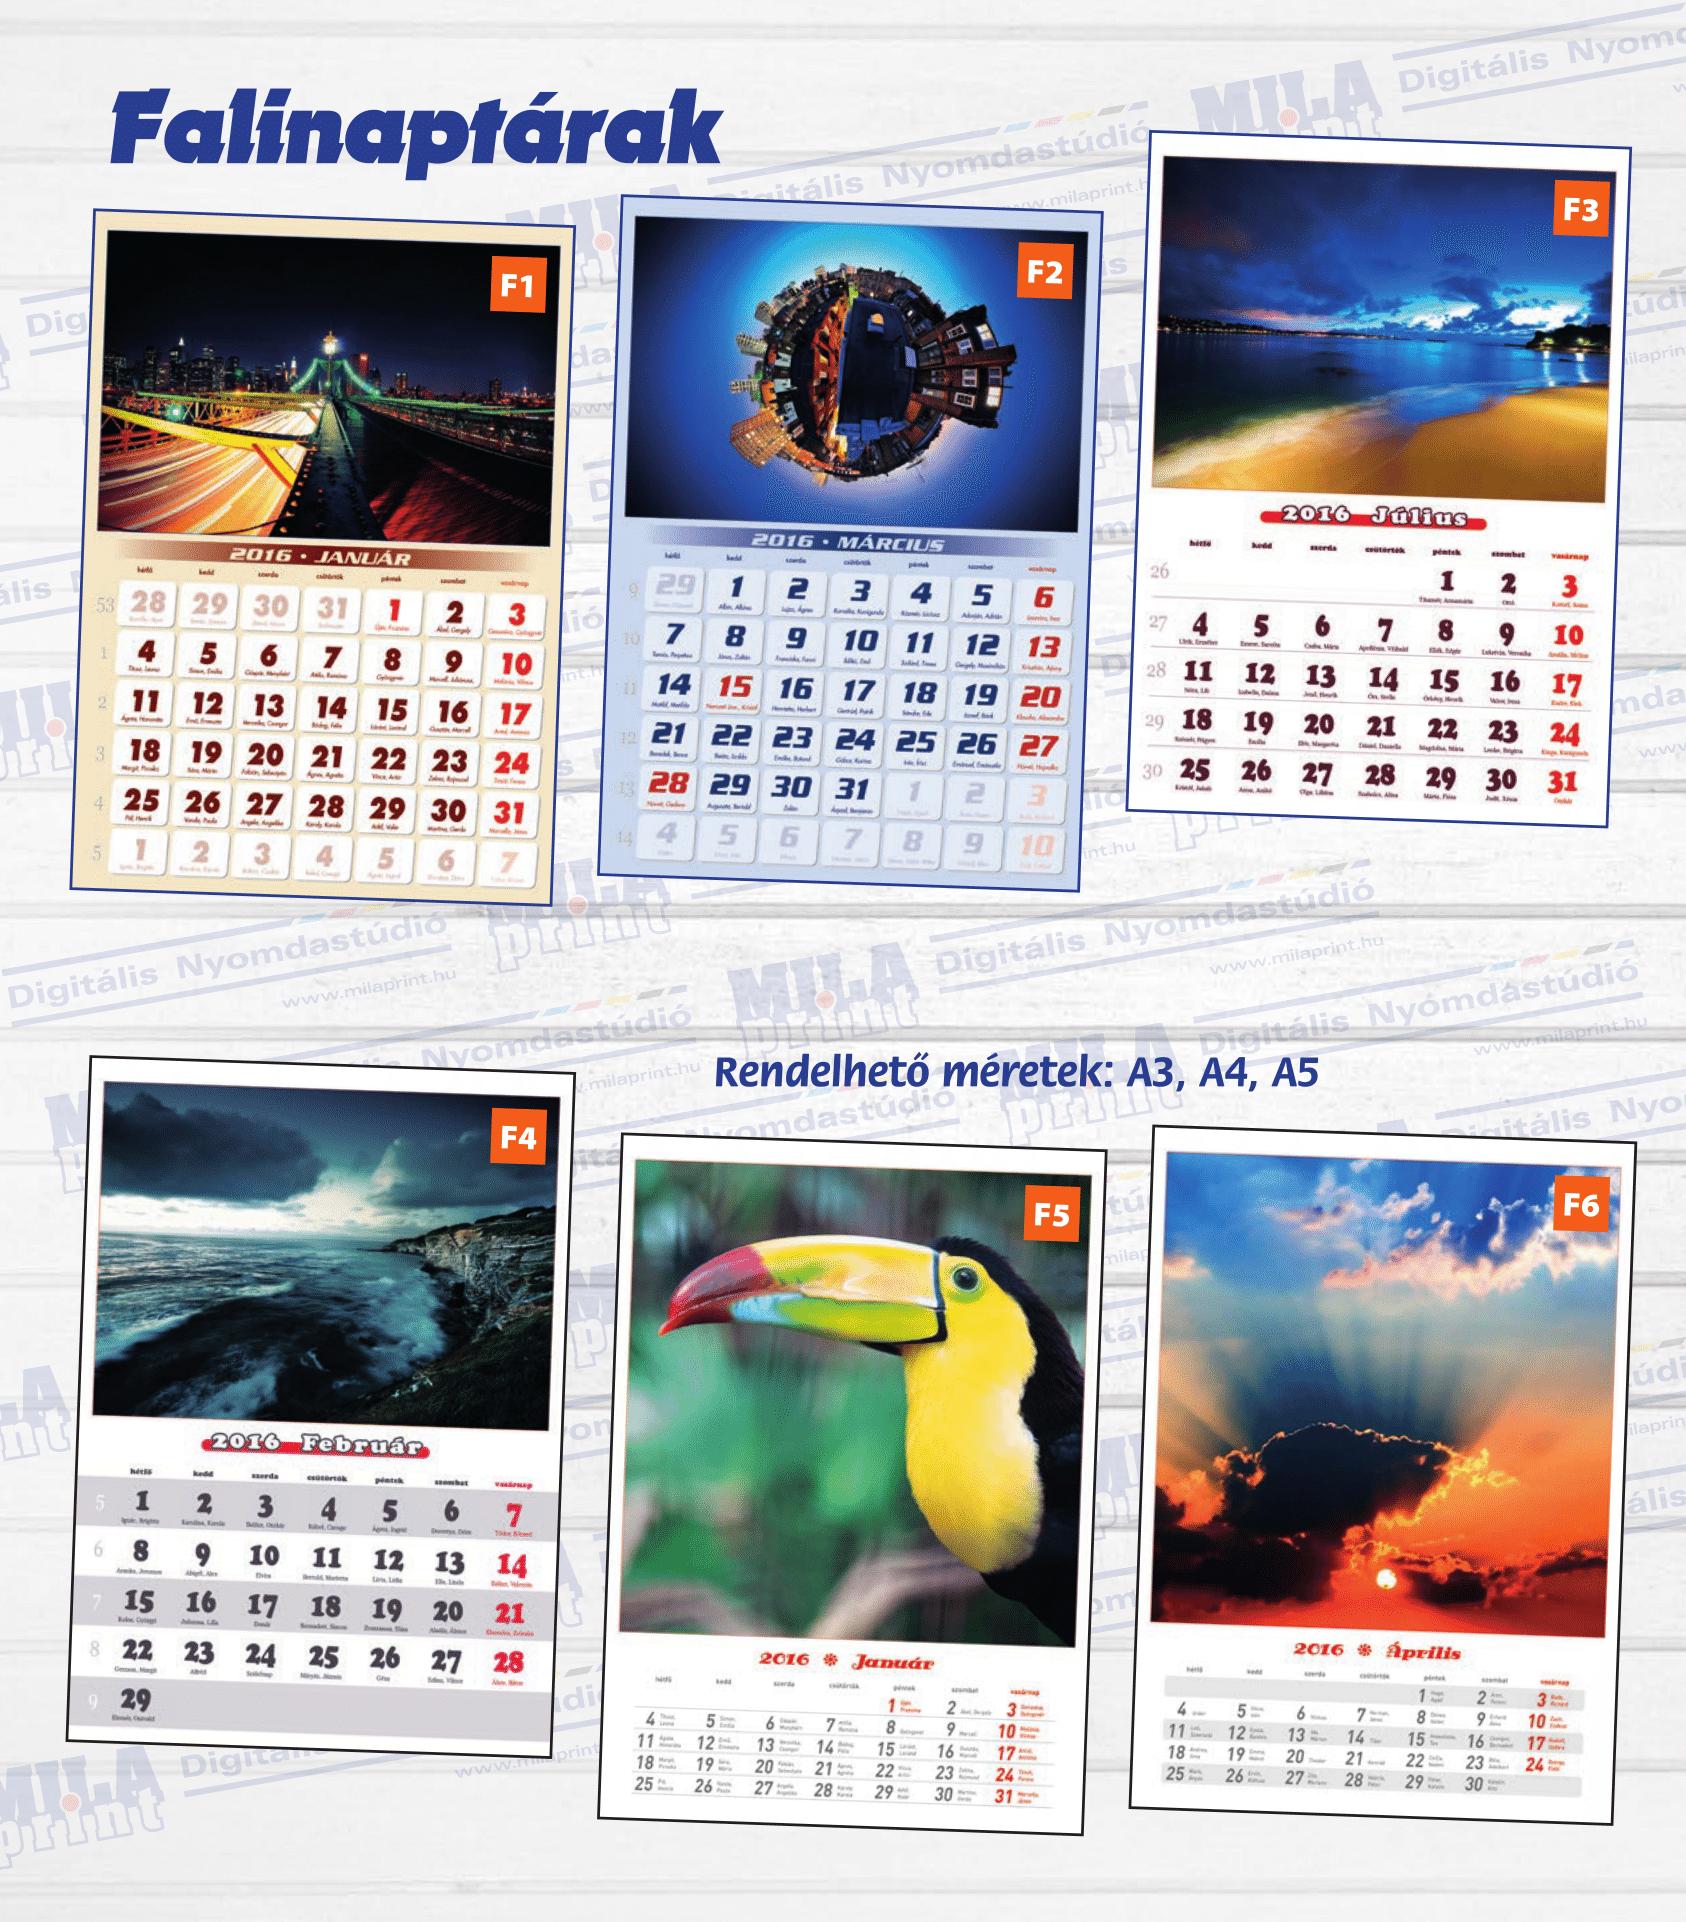 milaprint-2016-katalog-netre.compressed-2